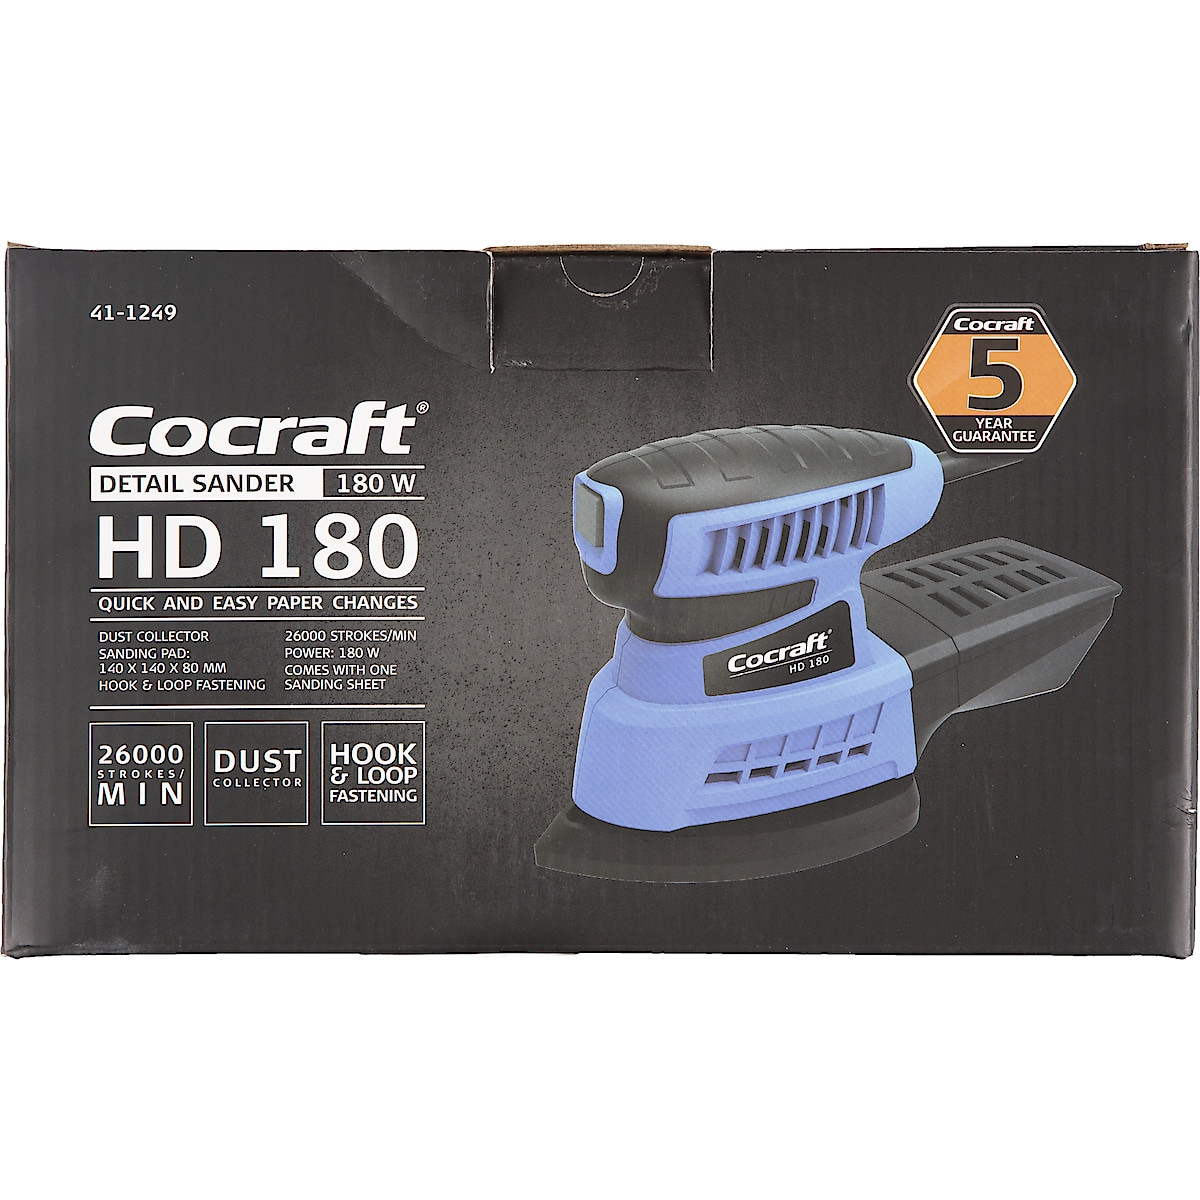 Hiomakone Cocraft HD 180